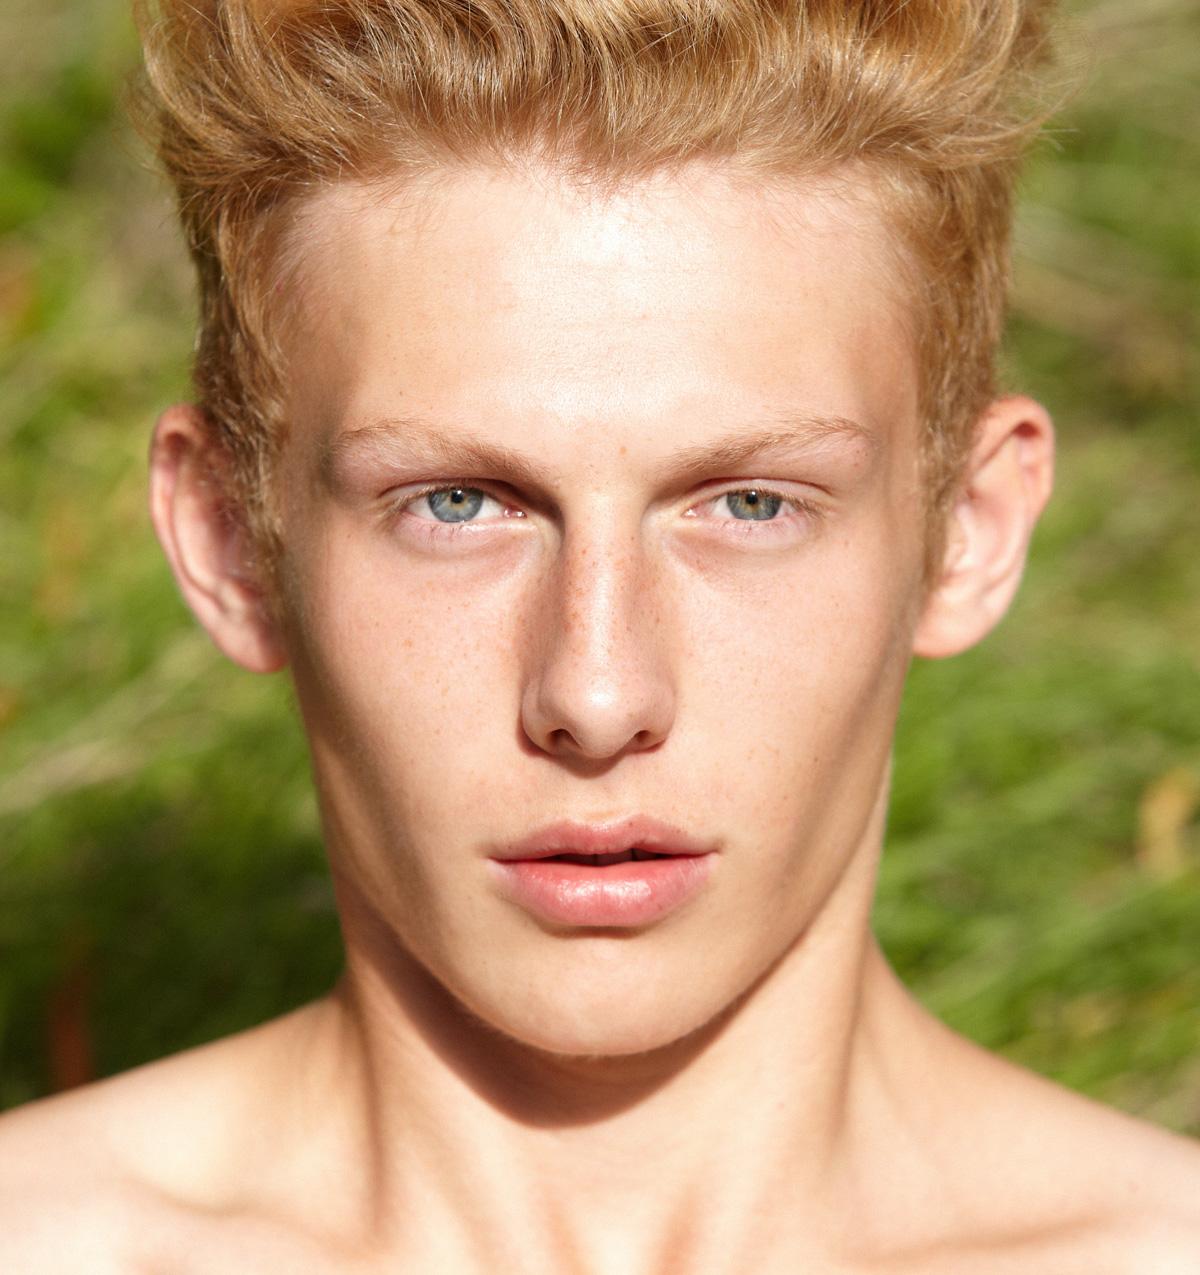 SAM-WALKER-Select-Models-Melissa-Uren-Photography-Look-20145-final-web.jpg